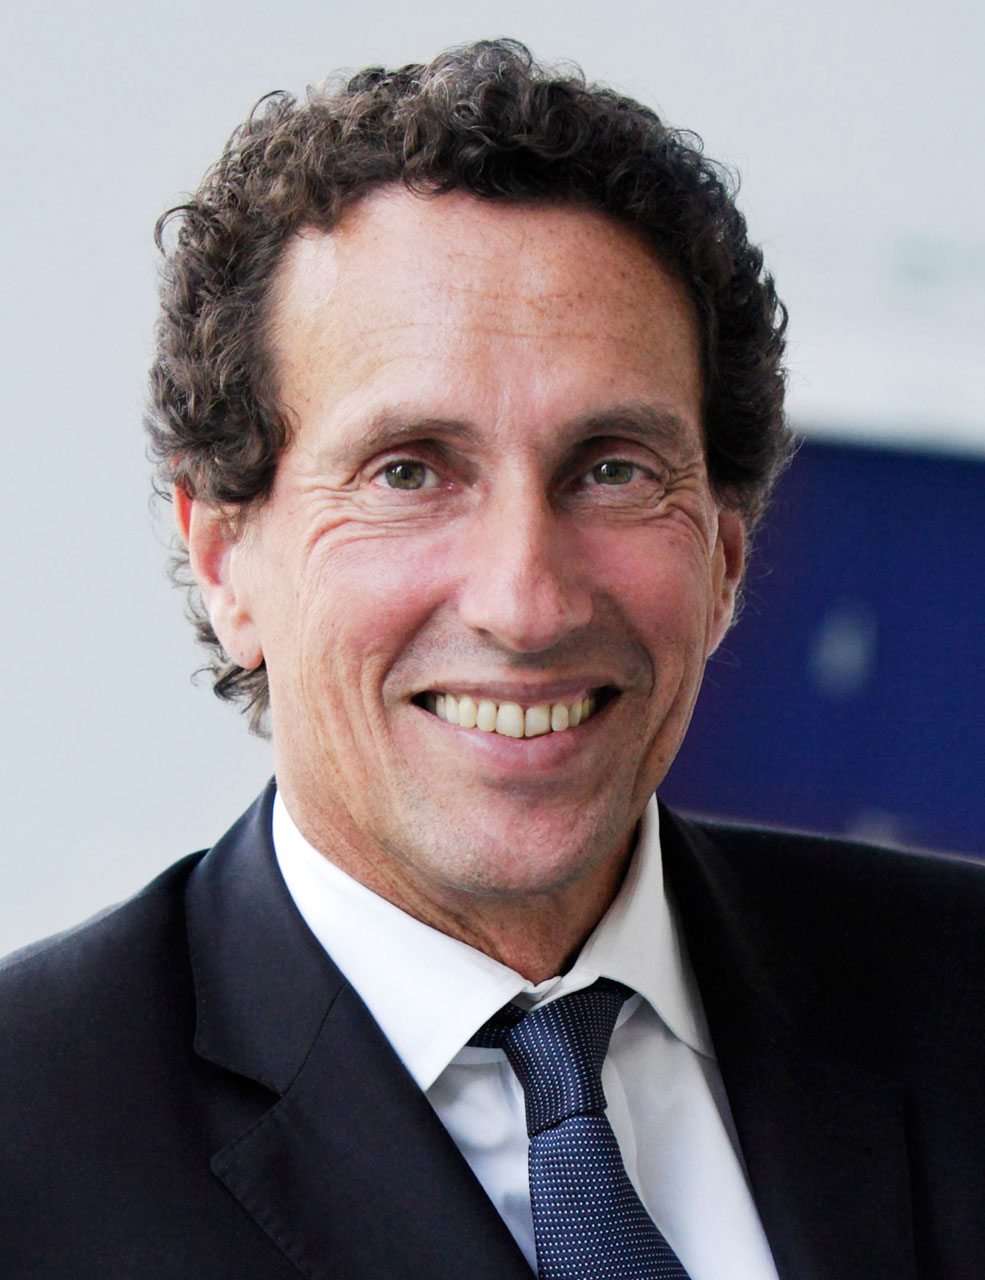 Prof. Dr. Dr. h. c. Julian Nida-Rümelin| Salon21